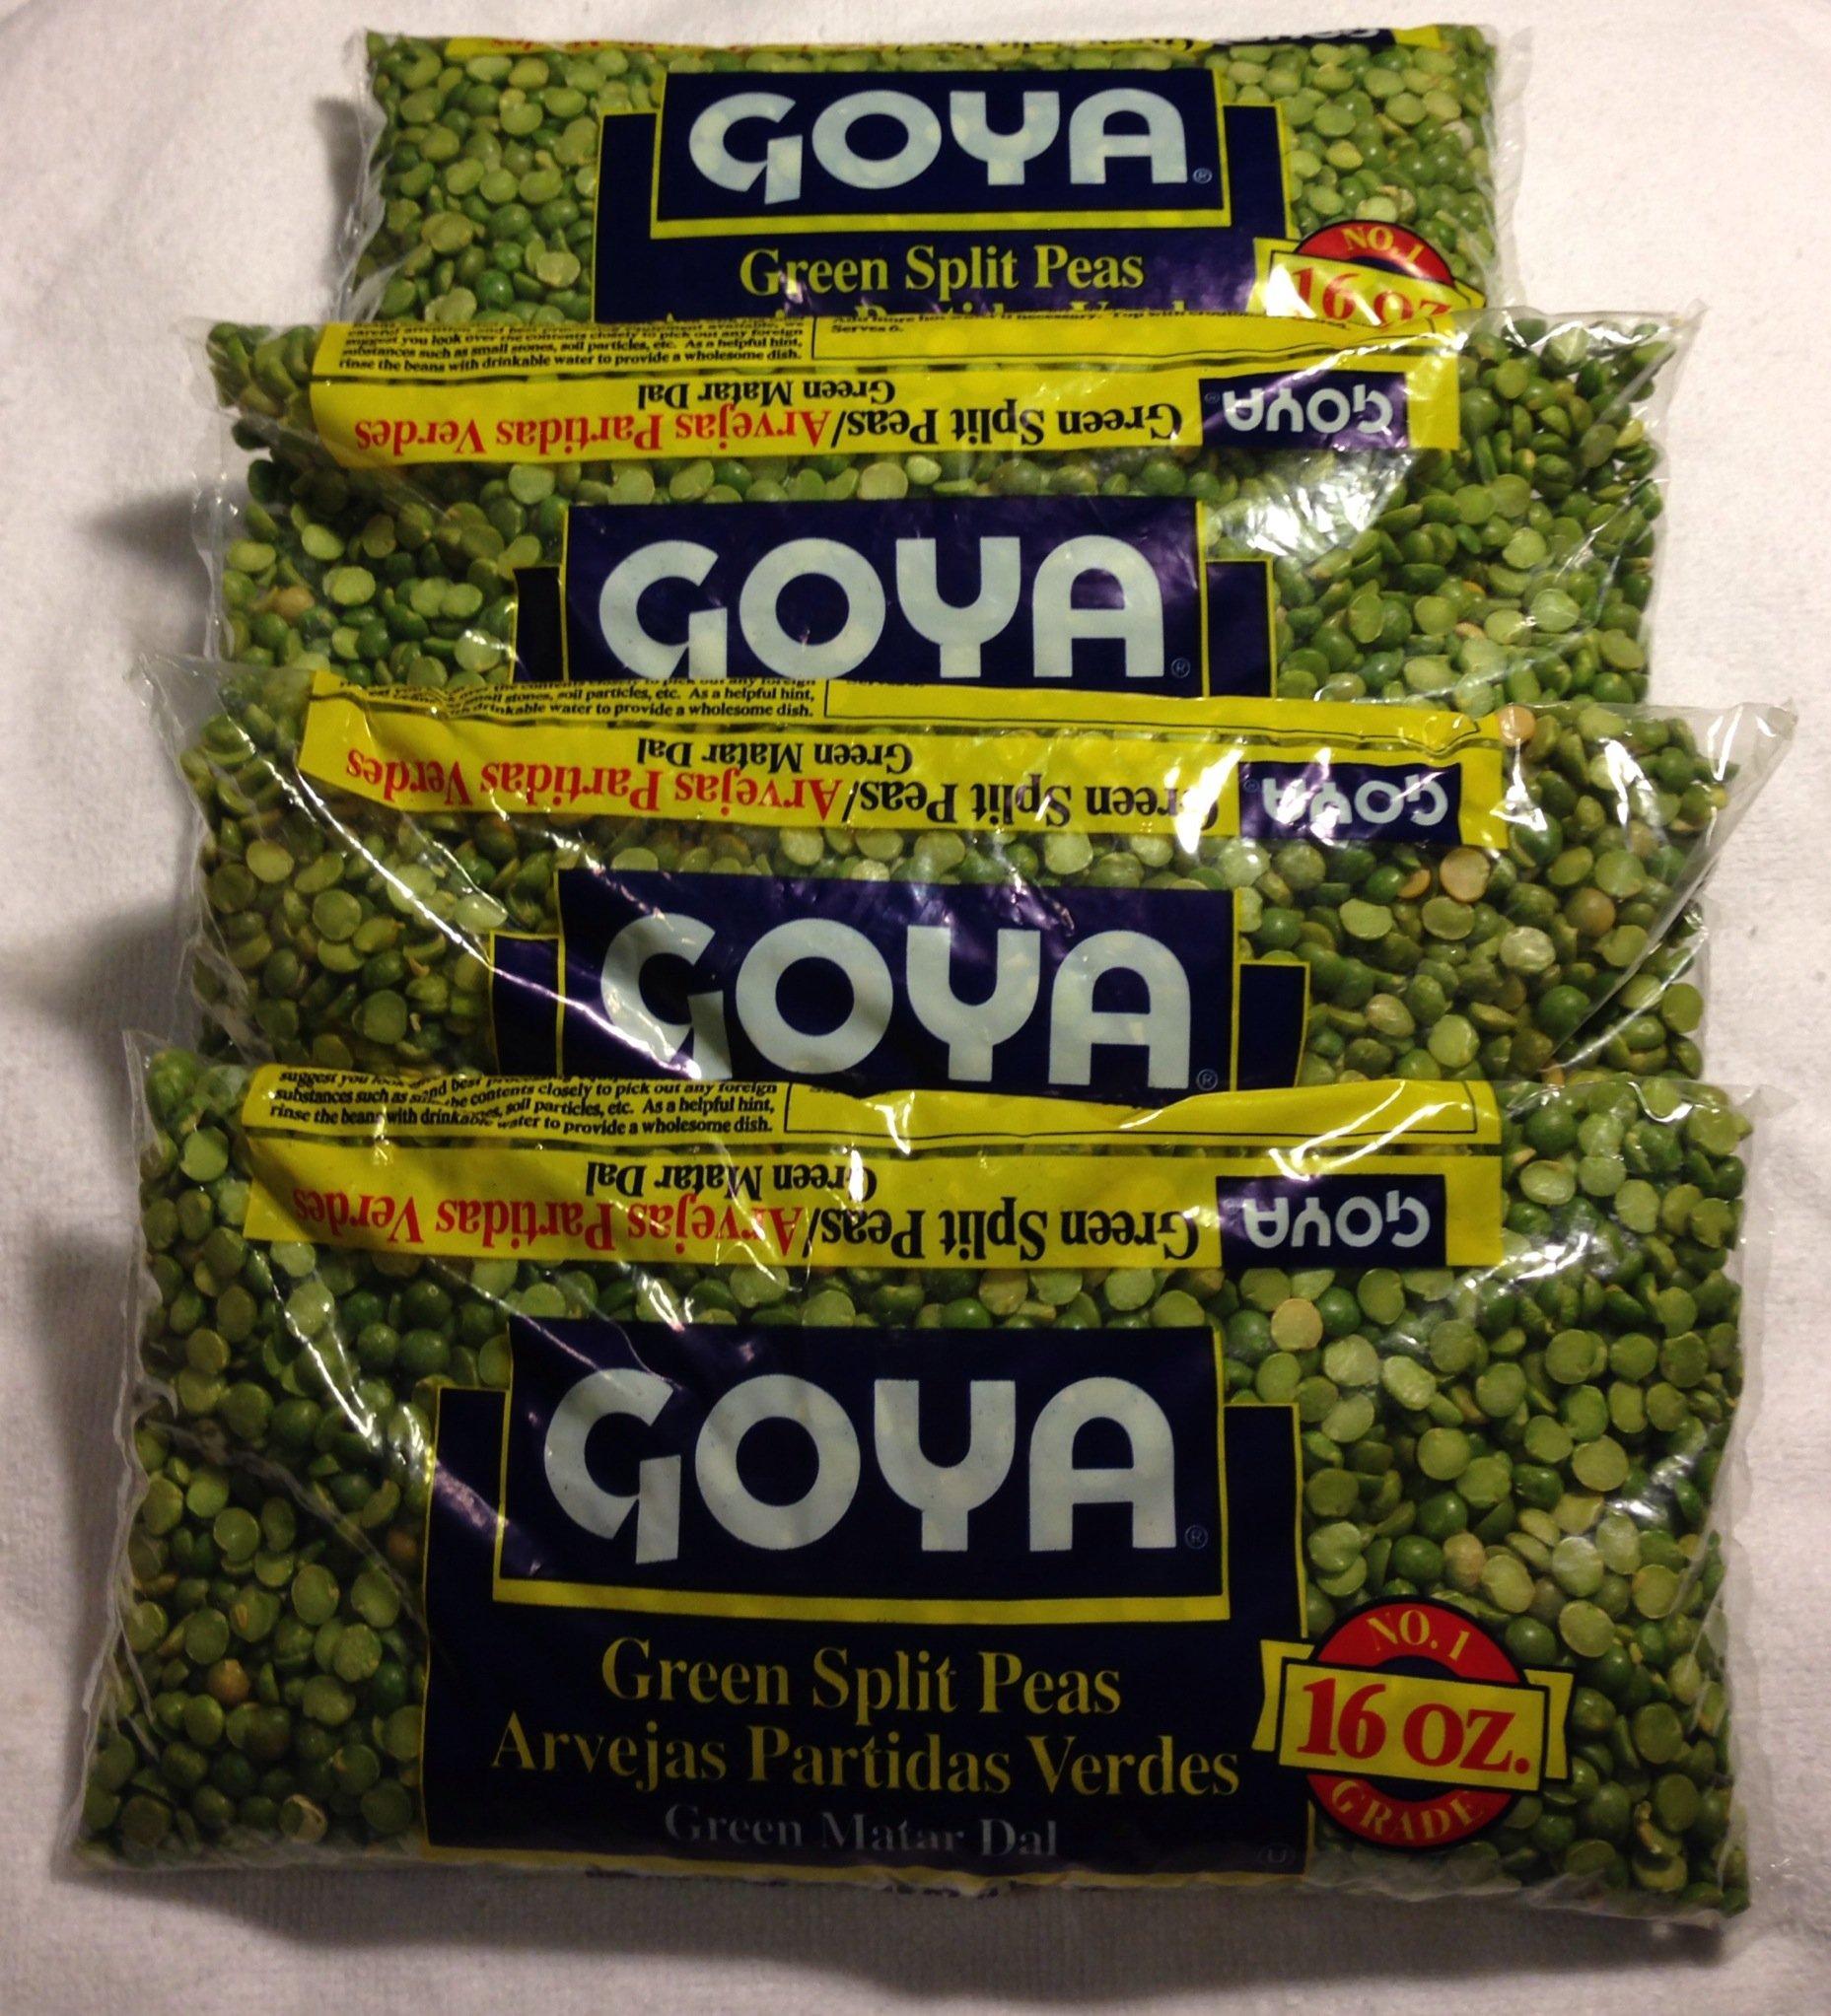 Goya Beans Green Split Peas, Dry, 4 - 1 Lb Bags (4 Pack) Dried - Great for Split Pea Soup